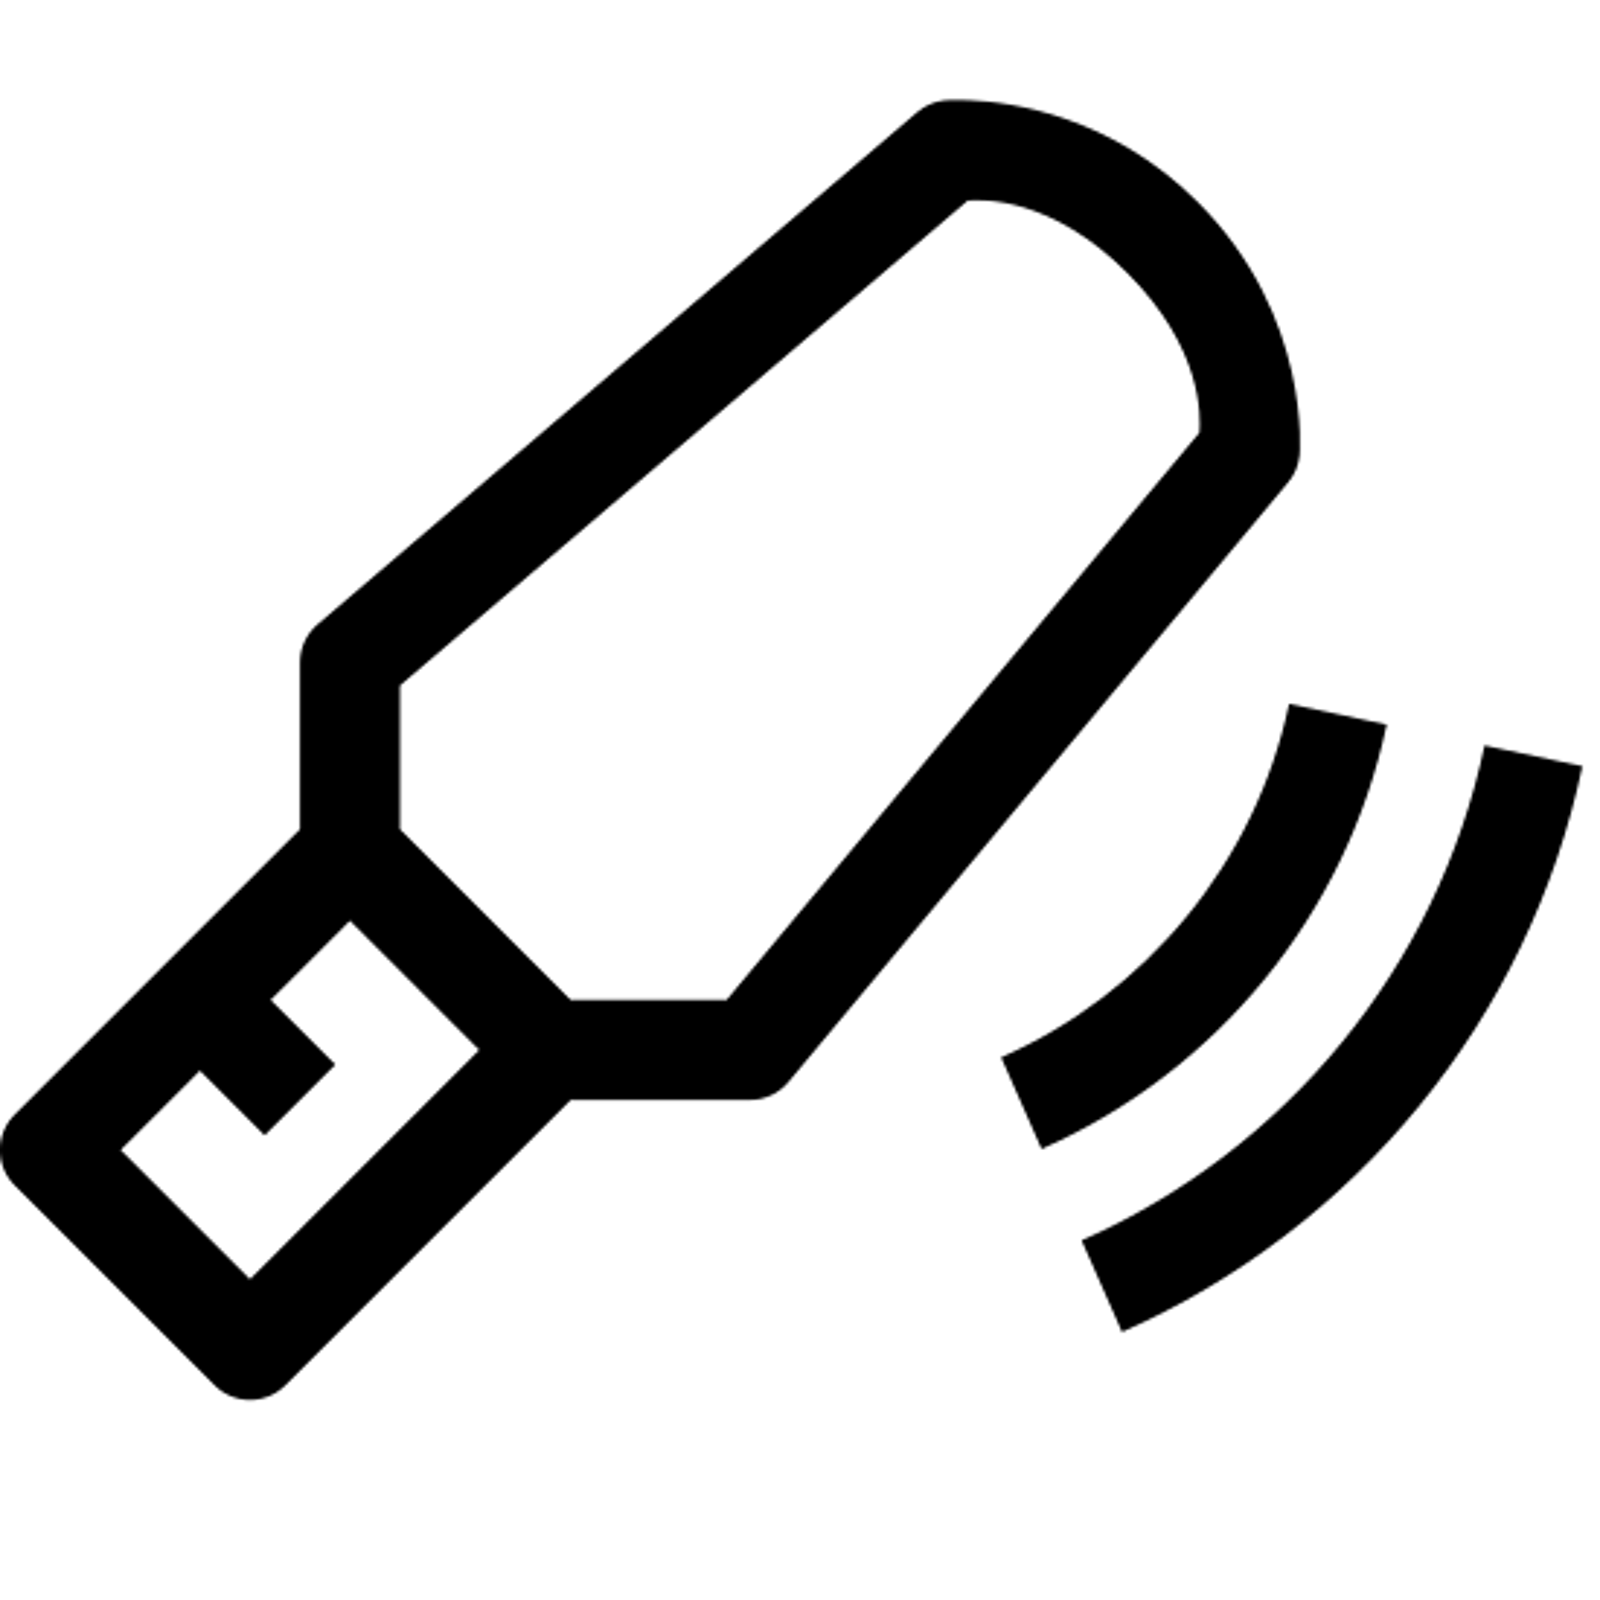 Hand-Held Metal Detector icon